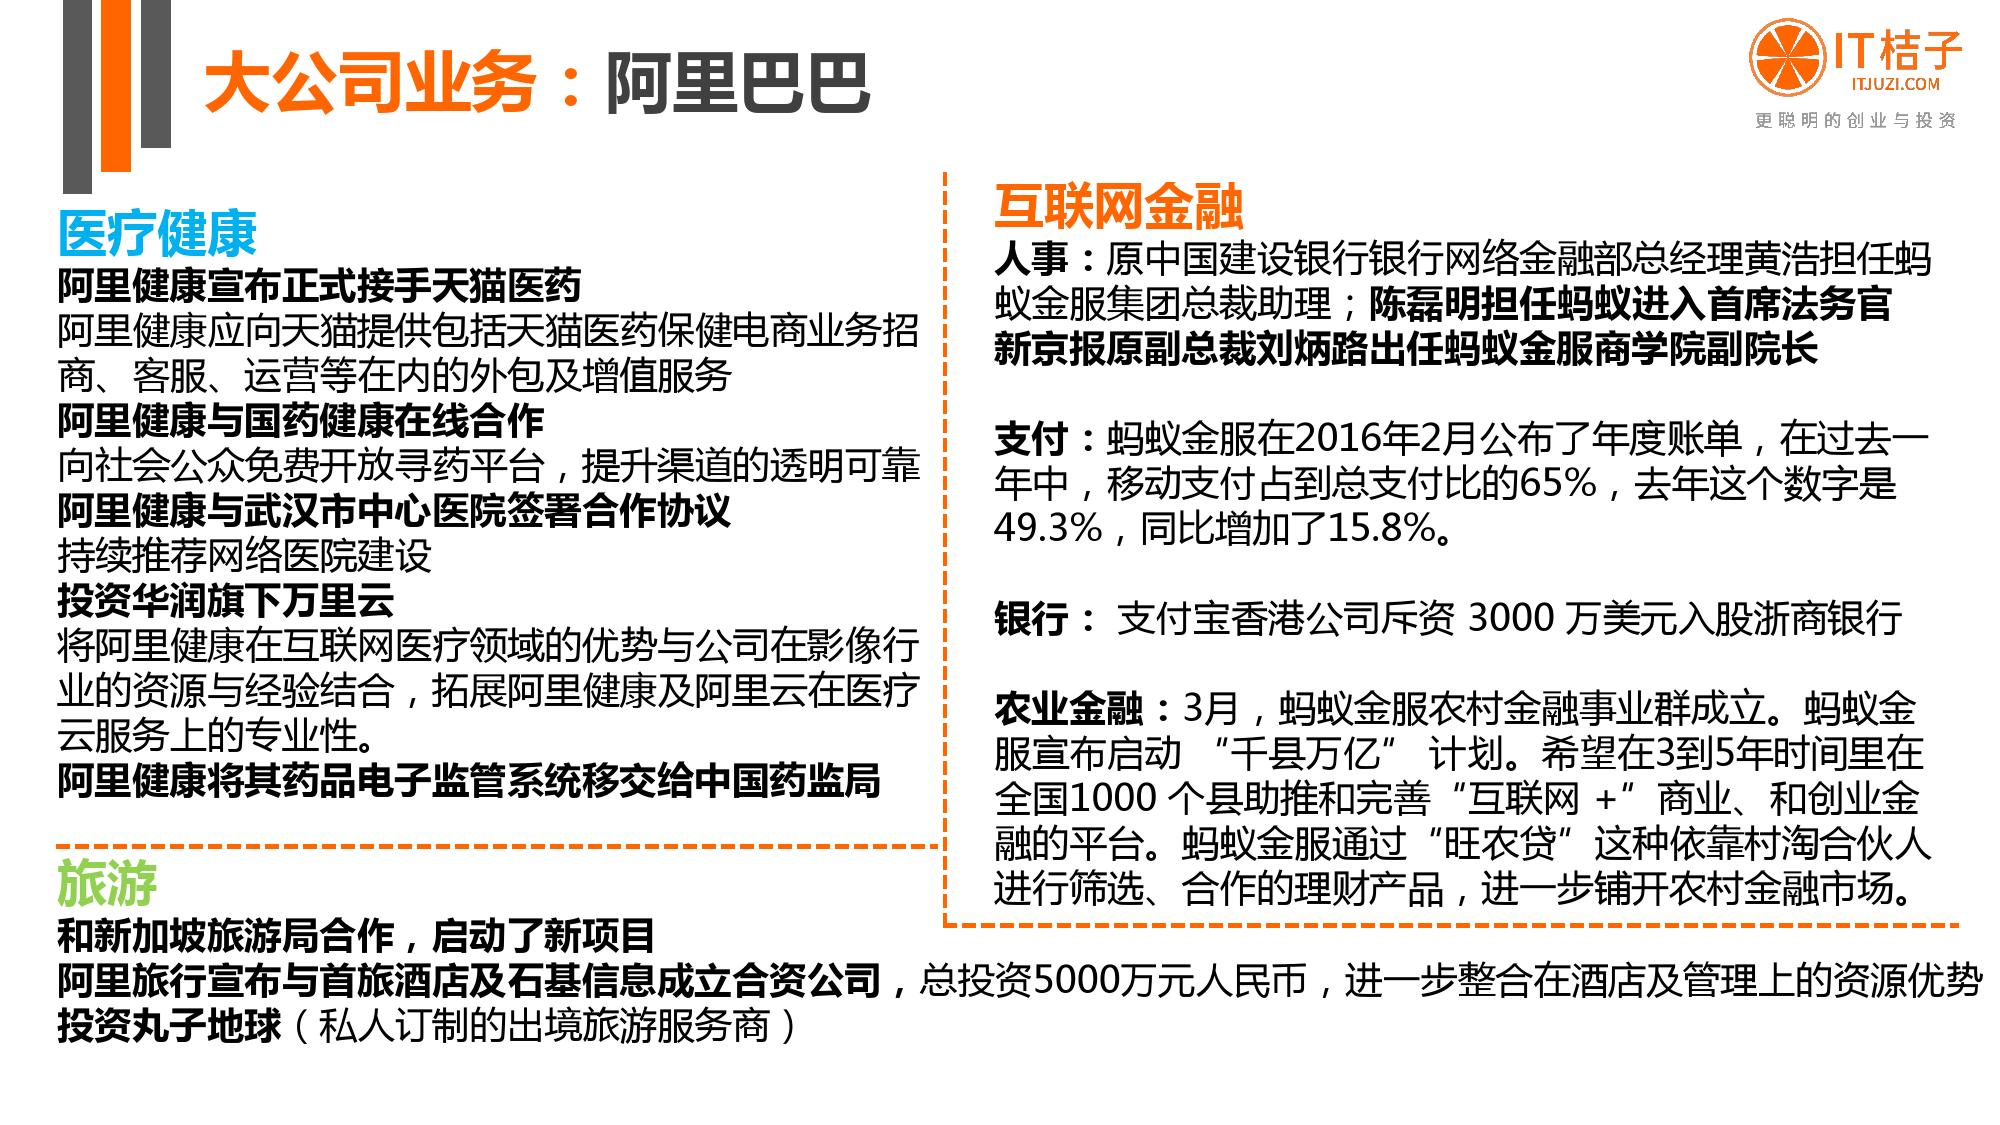 【IT桔子】2016年Q2中国互联网创业投资分析报告_000064